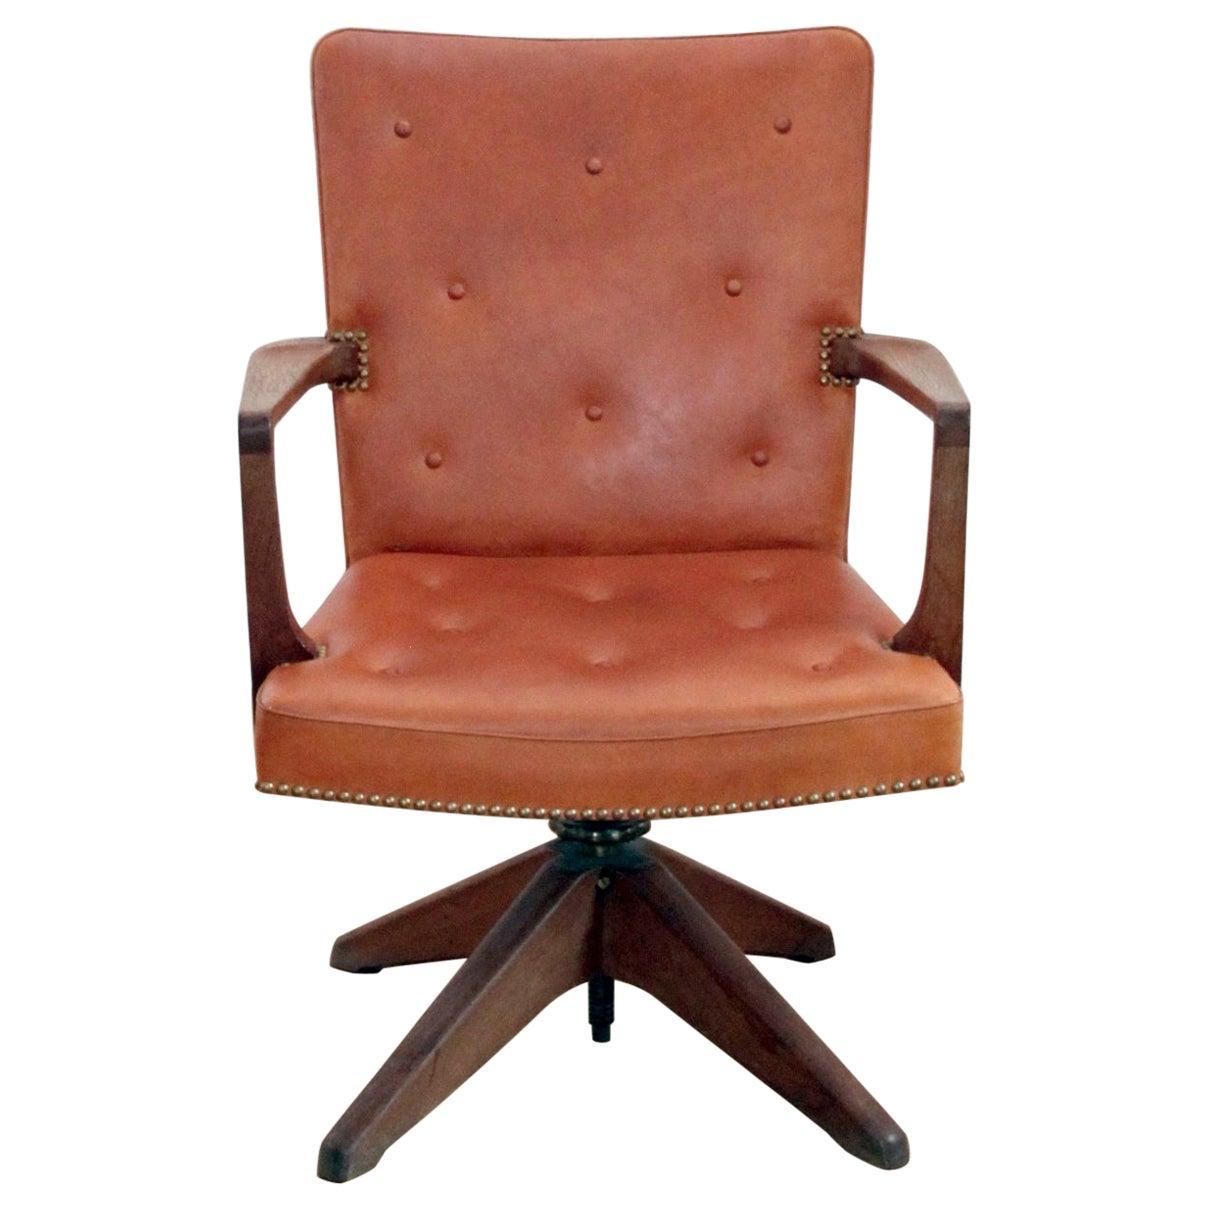 Palle Suenson, Rare Executive Desk Chair in Walnut, Brass and Leather, 1940s